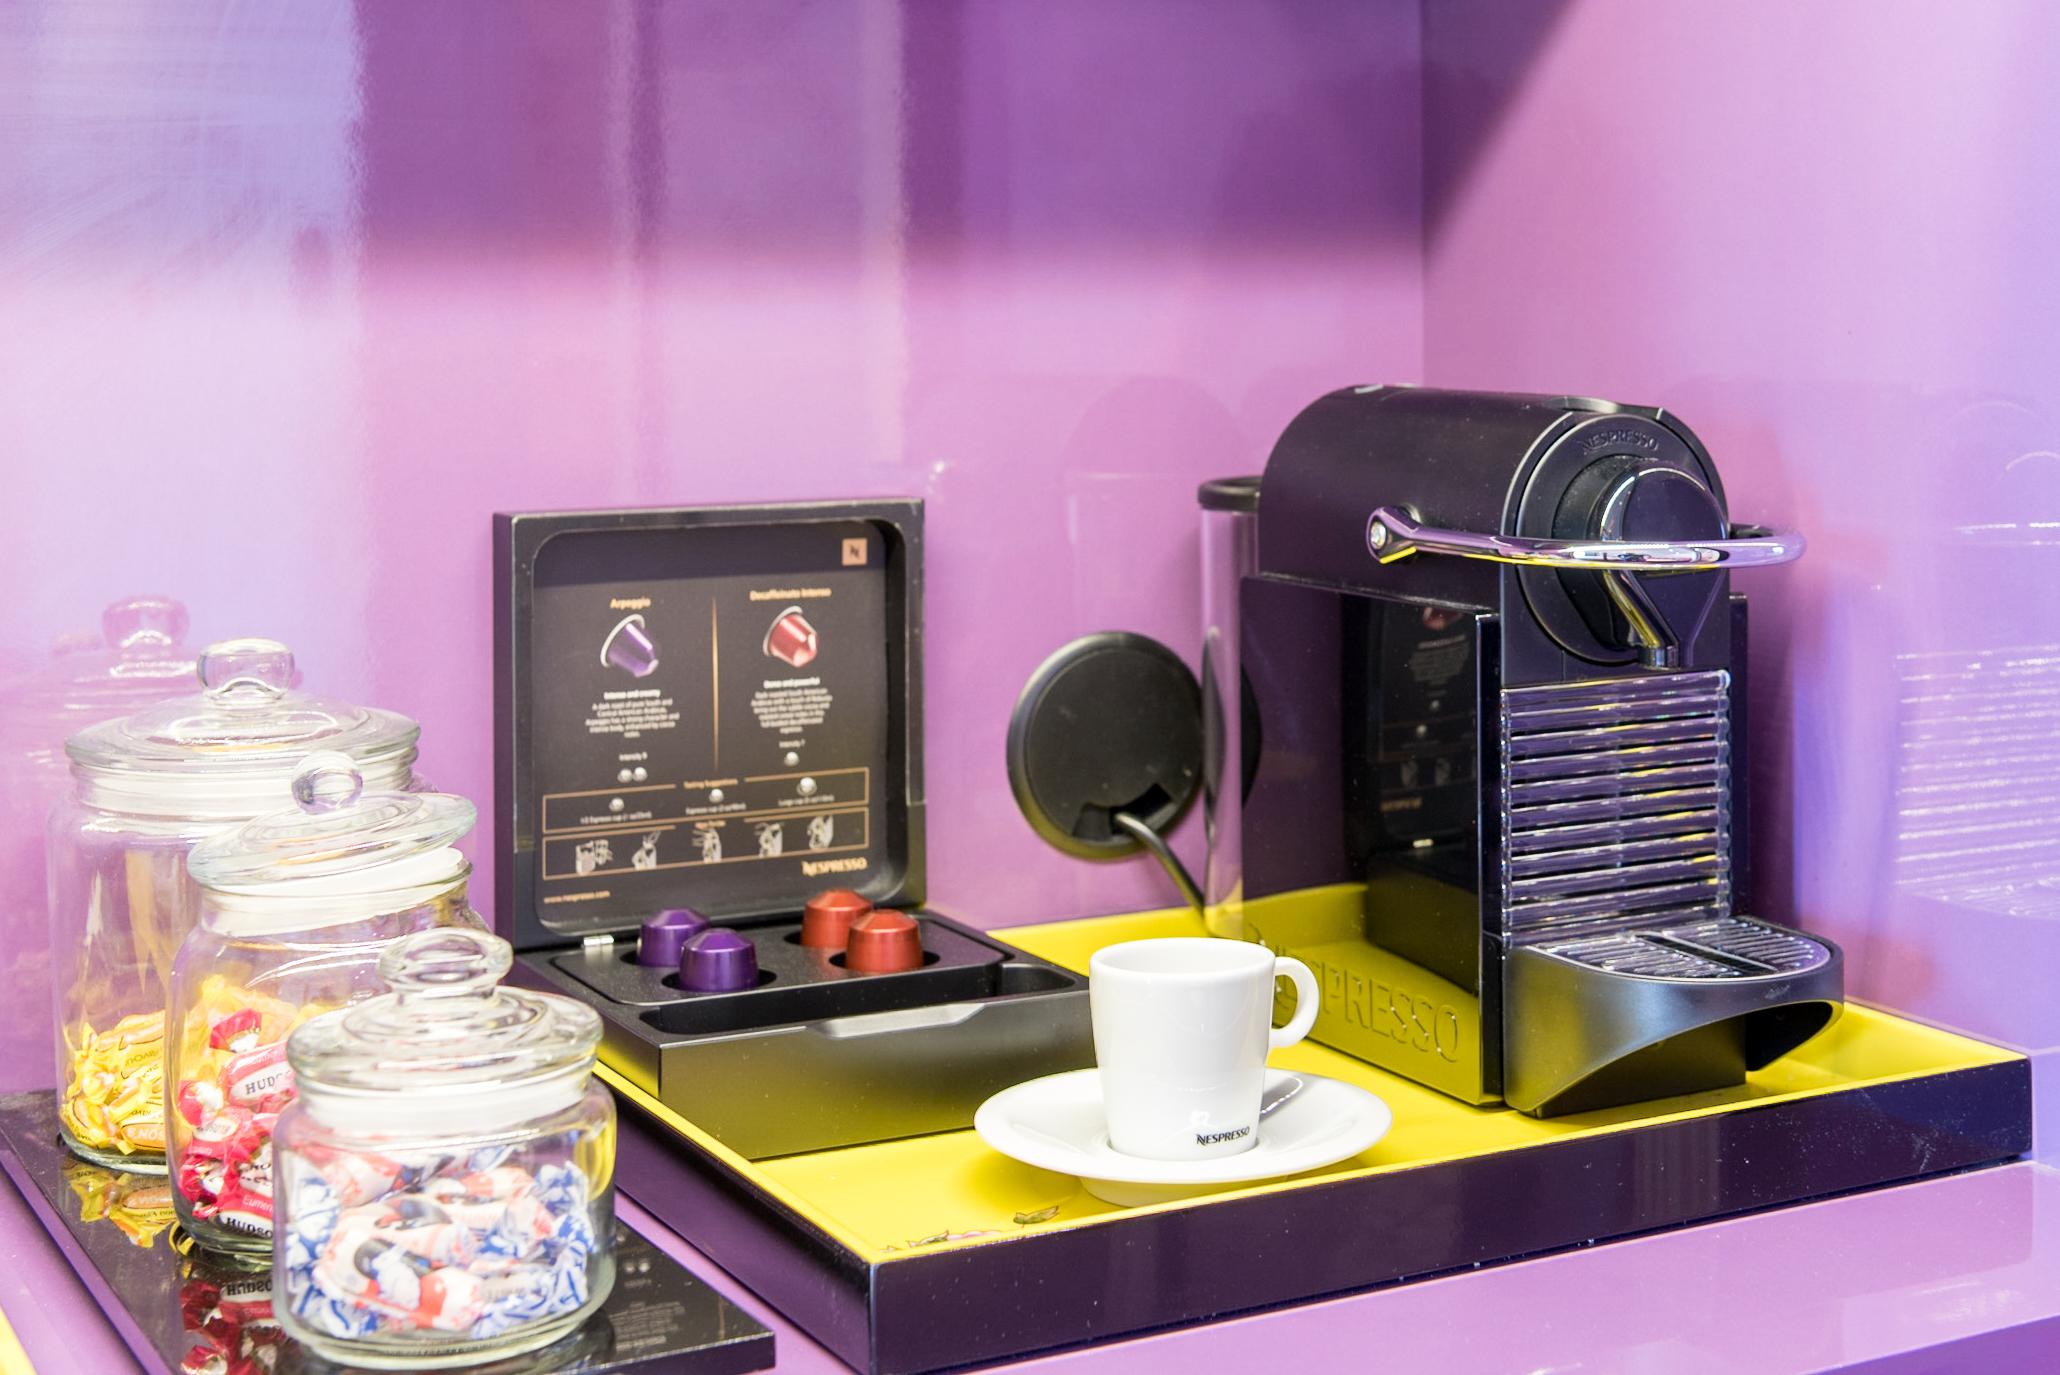 Nespresso Coffee Machine  Premier View Room with Bathtub - Hotel Indigo Singapore Katong